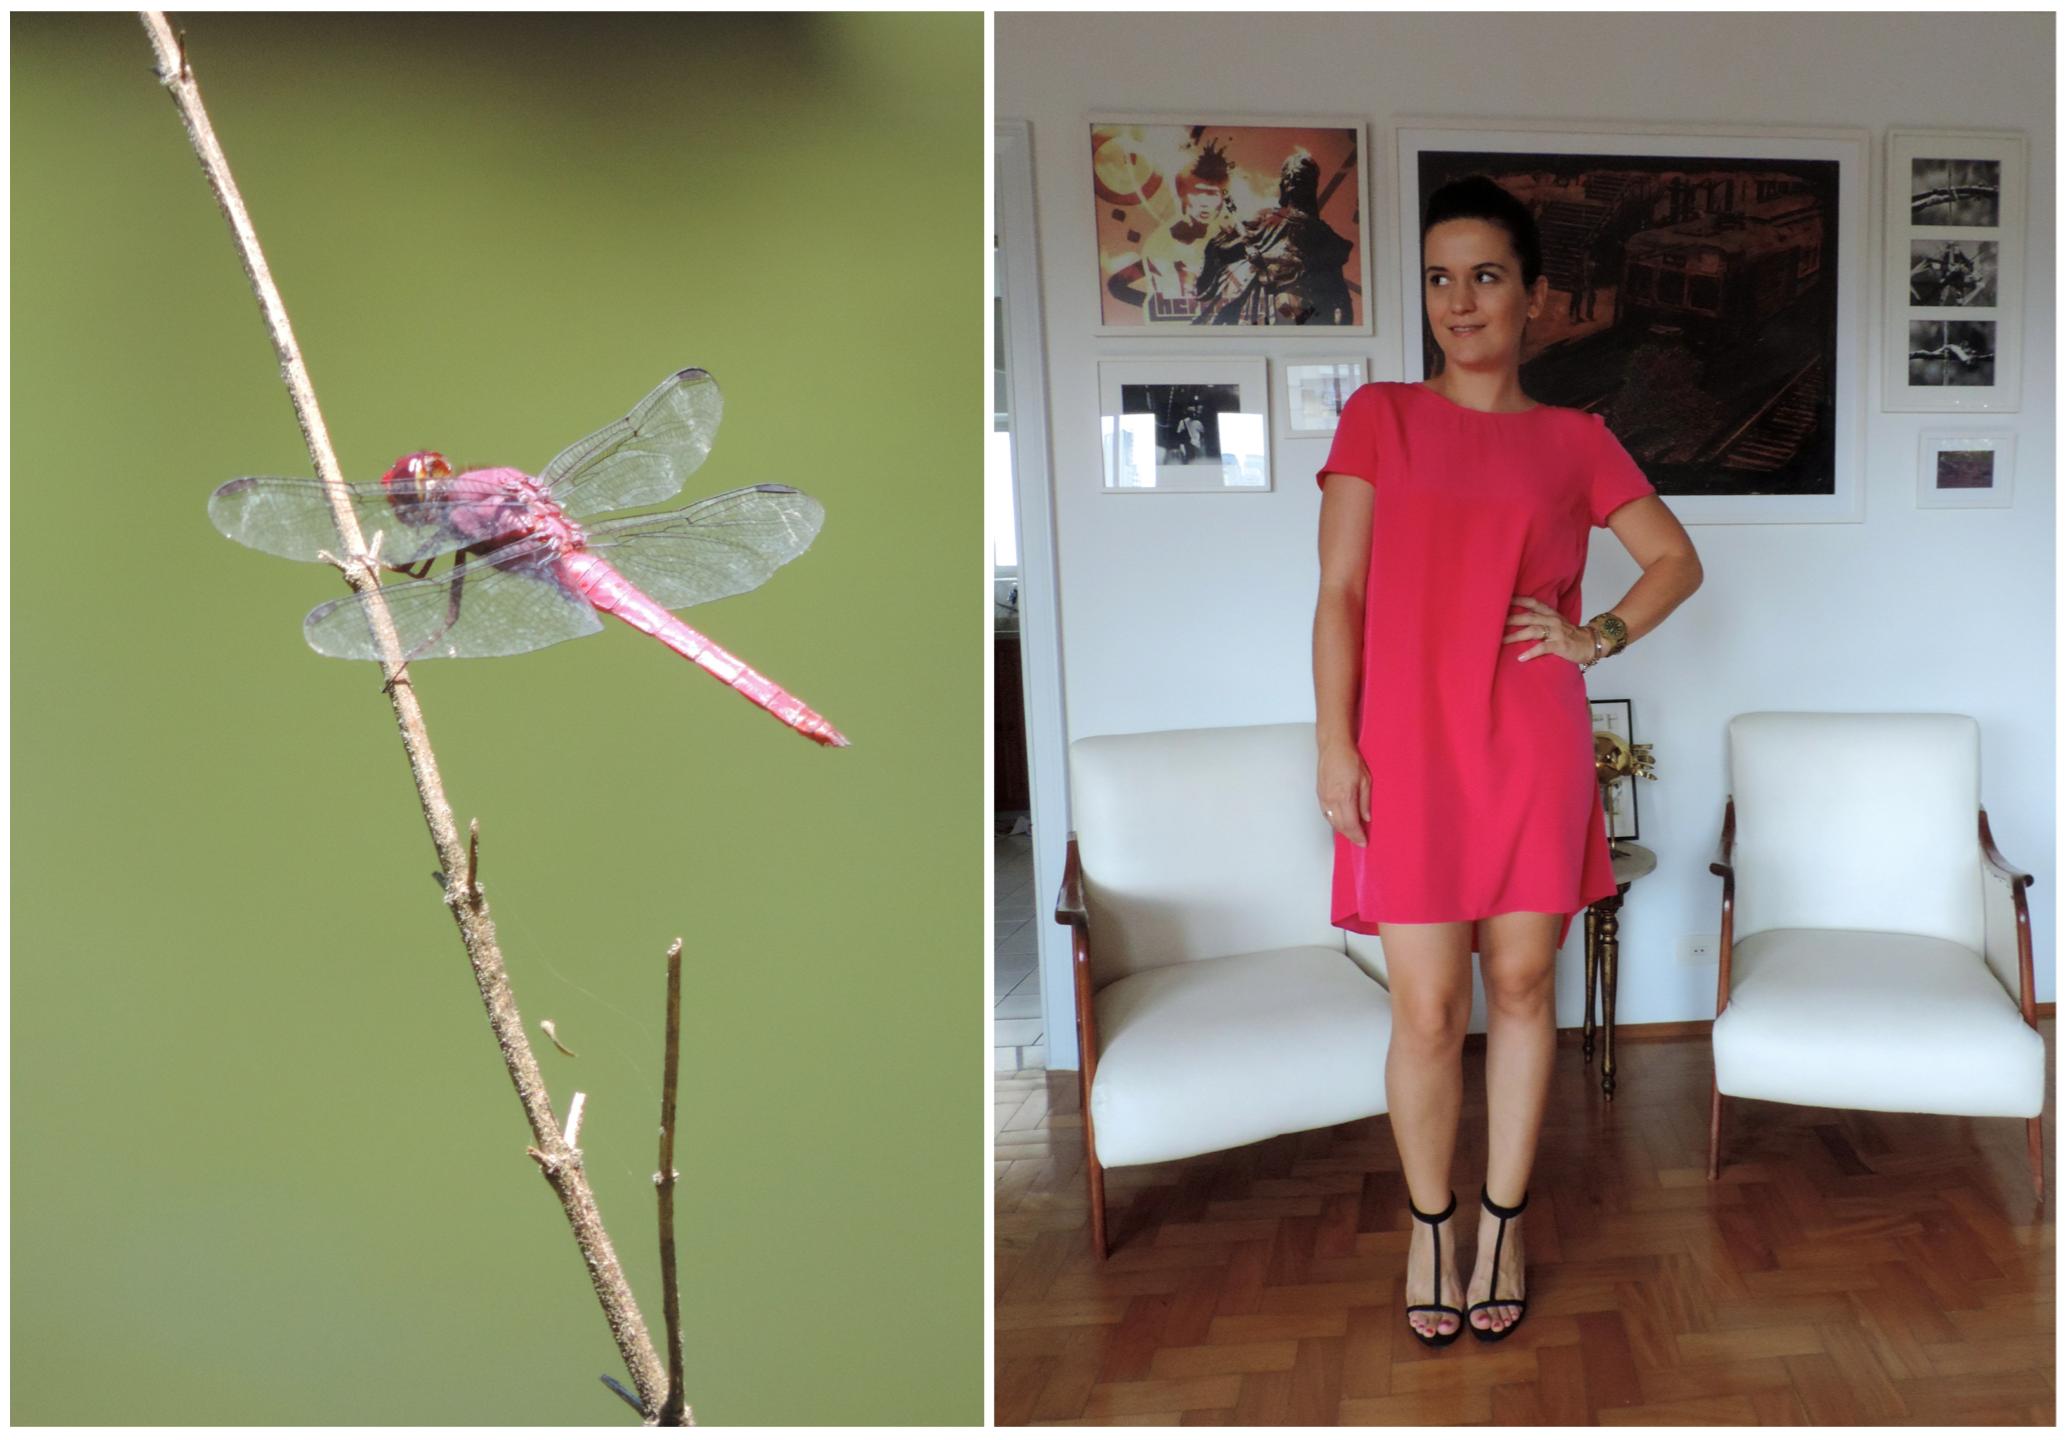 Bicho do Dia - Libélula #look #ootd #moda #fashion #cea #santalolla Link: http://www.bloganimalchic.com/2014/02/13/bichododia-libelula-cor-de-rosa/